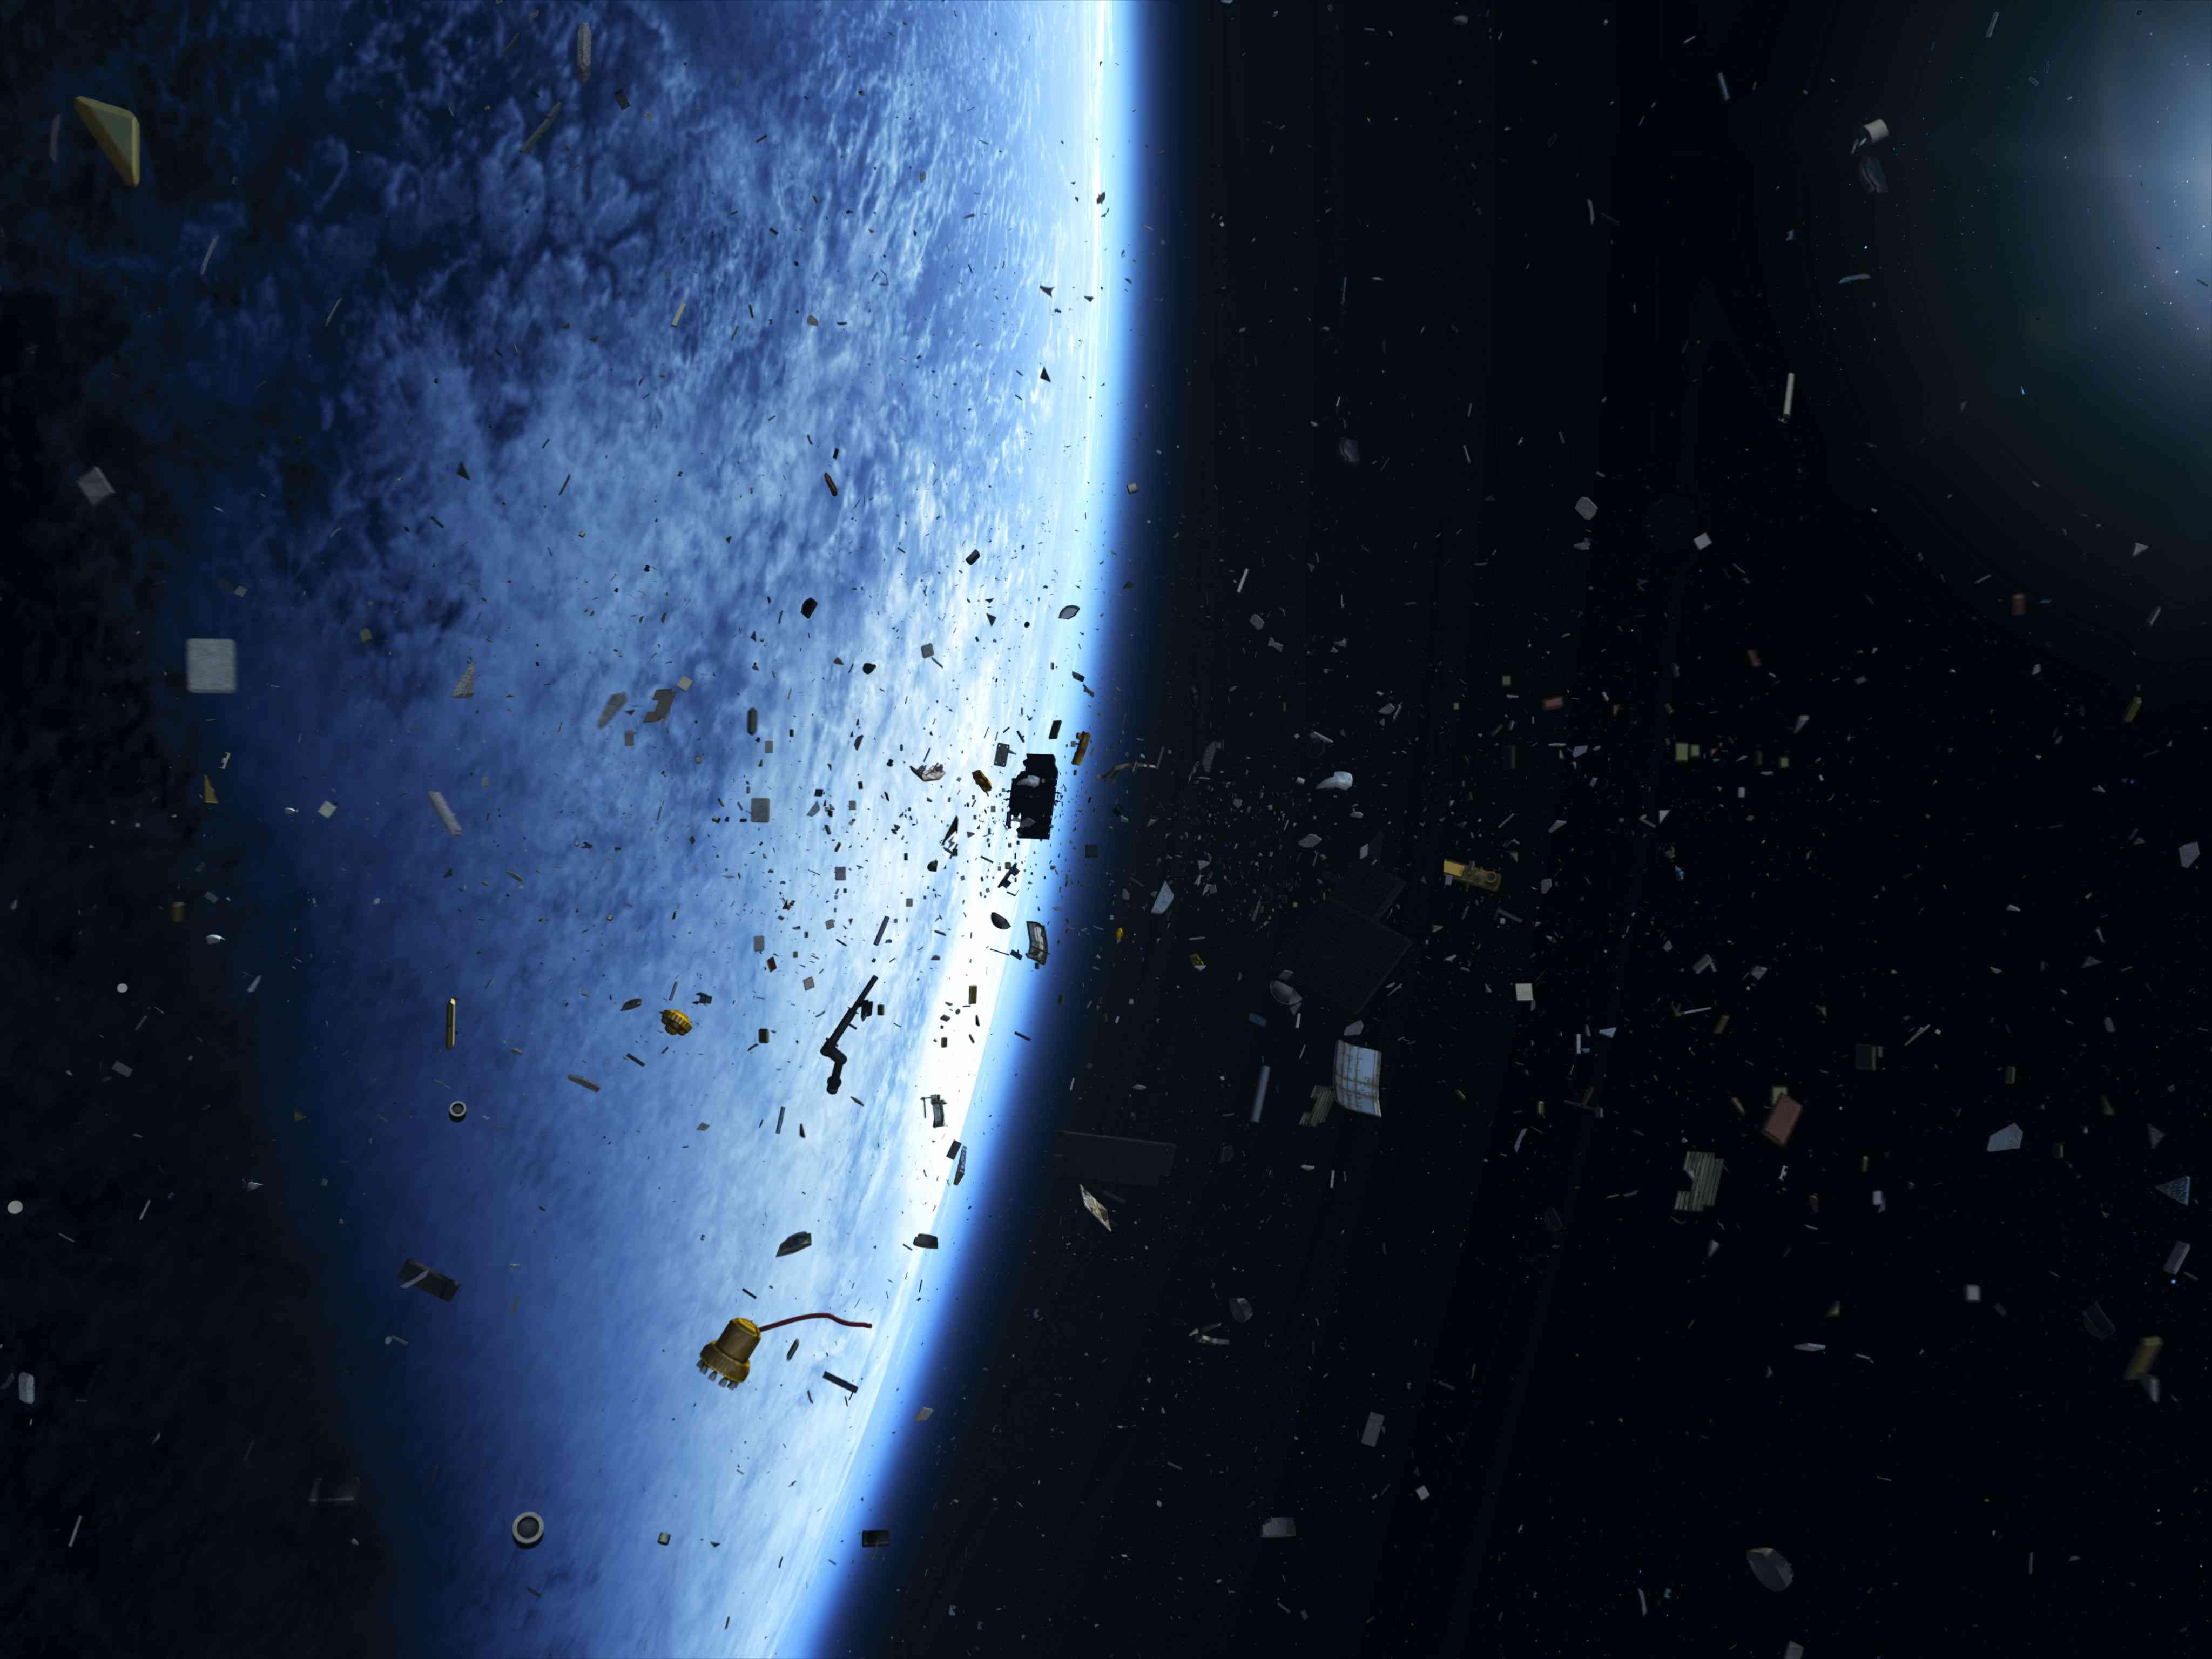 space junk illustration